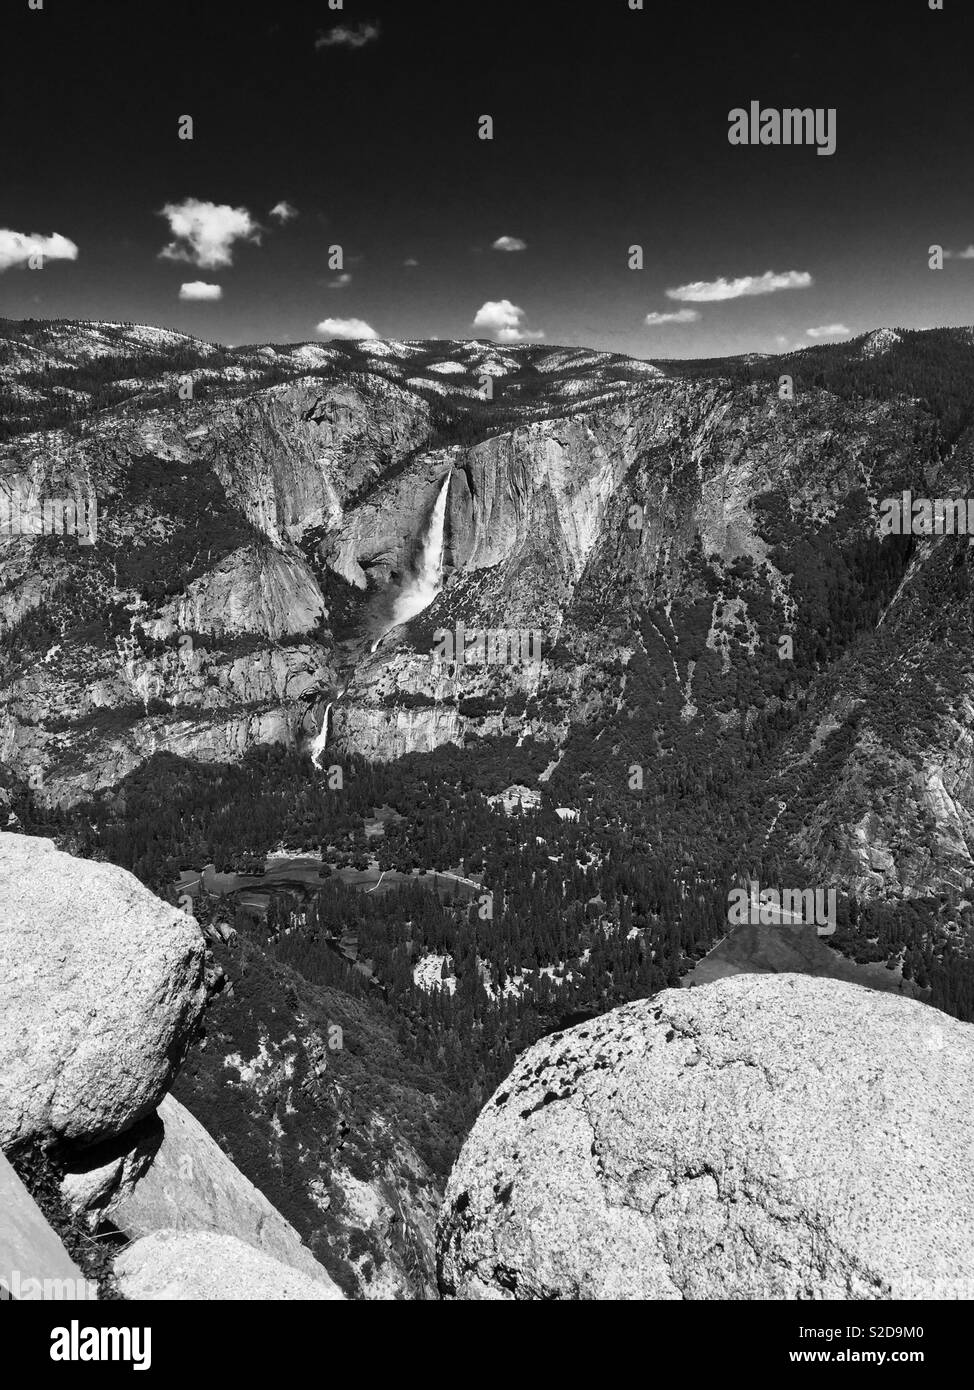 Large waterfall in Yosemite National Park - Stock Image